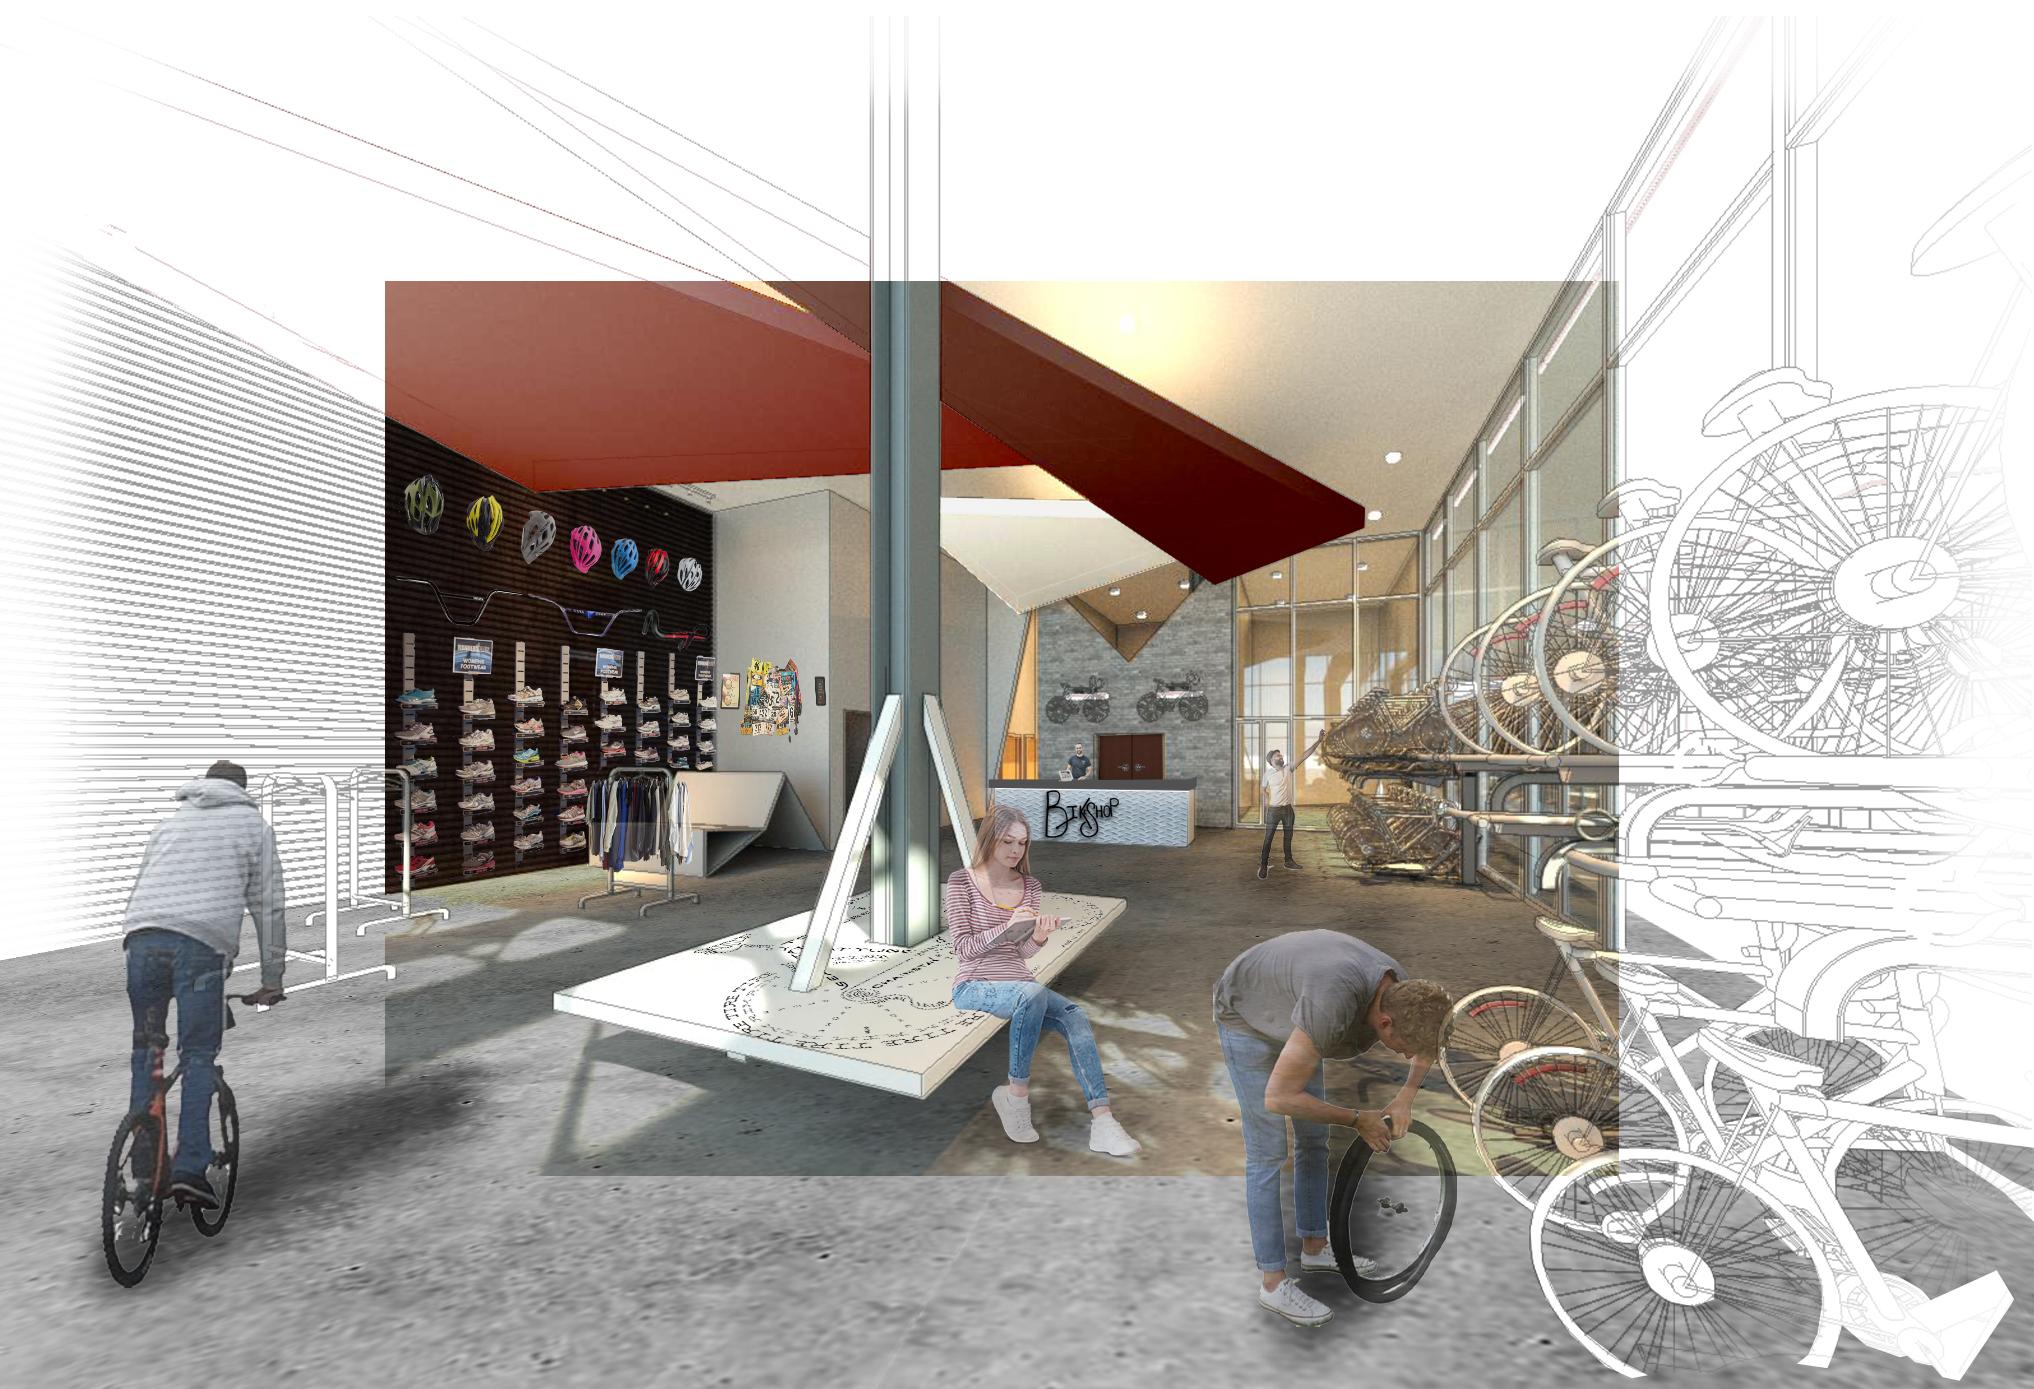 Bike Hostel Retail Space